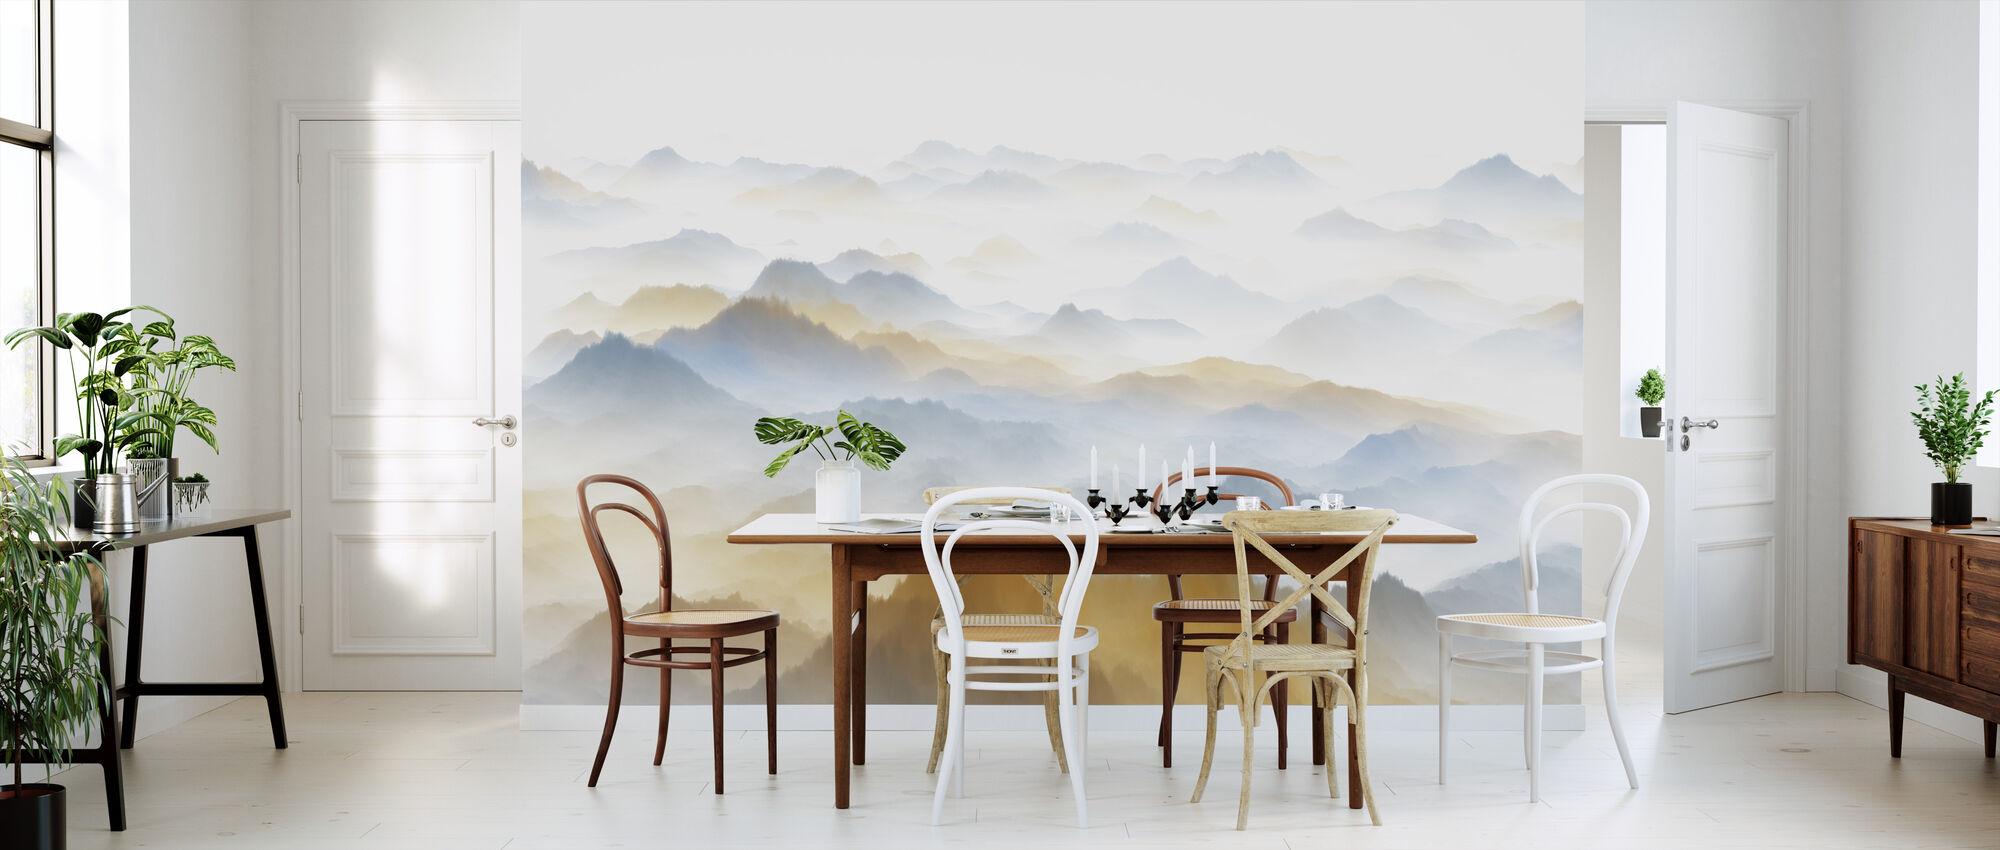 Murky Scenery - Wallpaper - Kitchen